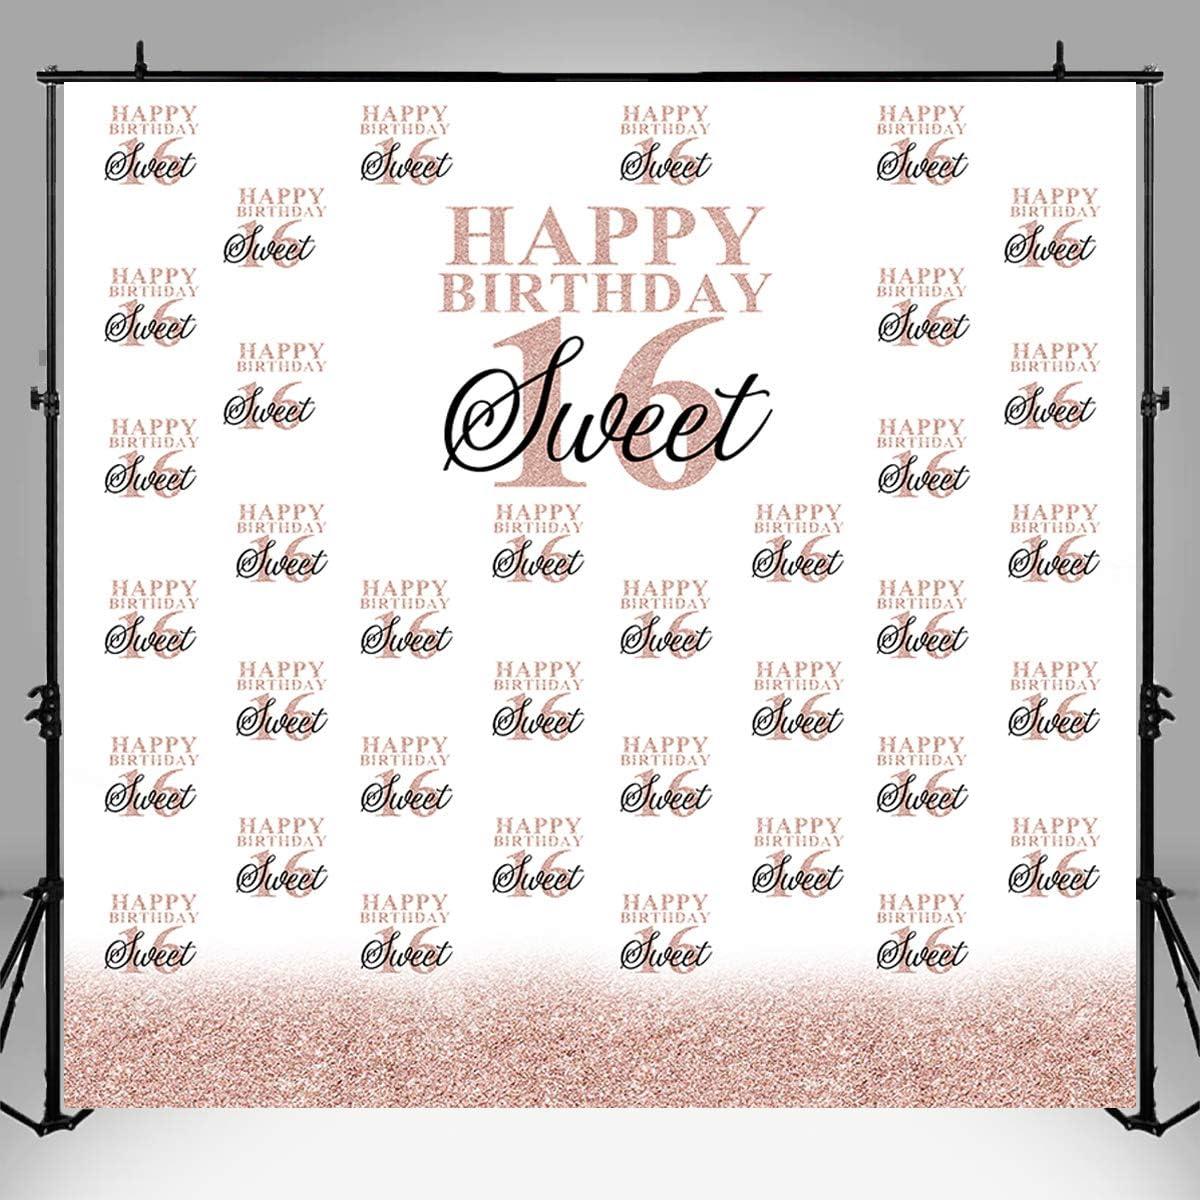 Sensfun Sweet Weekly update Sixteen 16 Backdrop 2021 model Birthday Re Rose Gold Step and